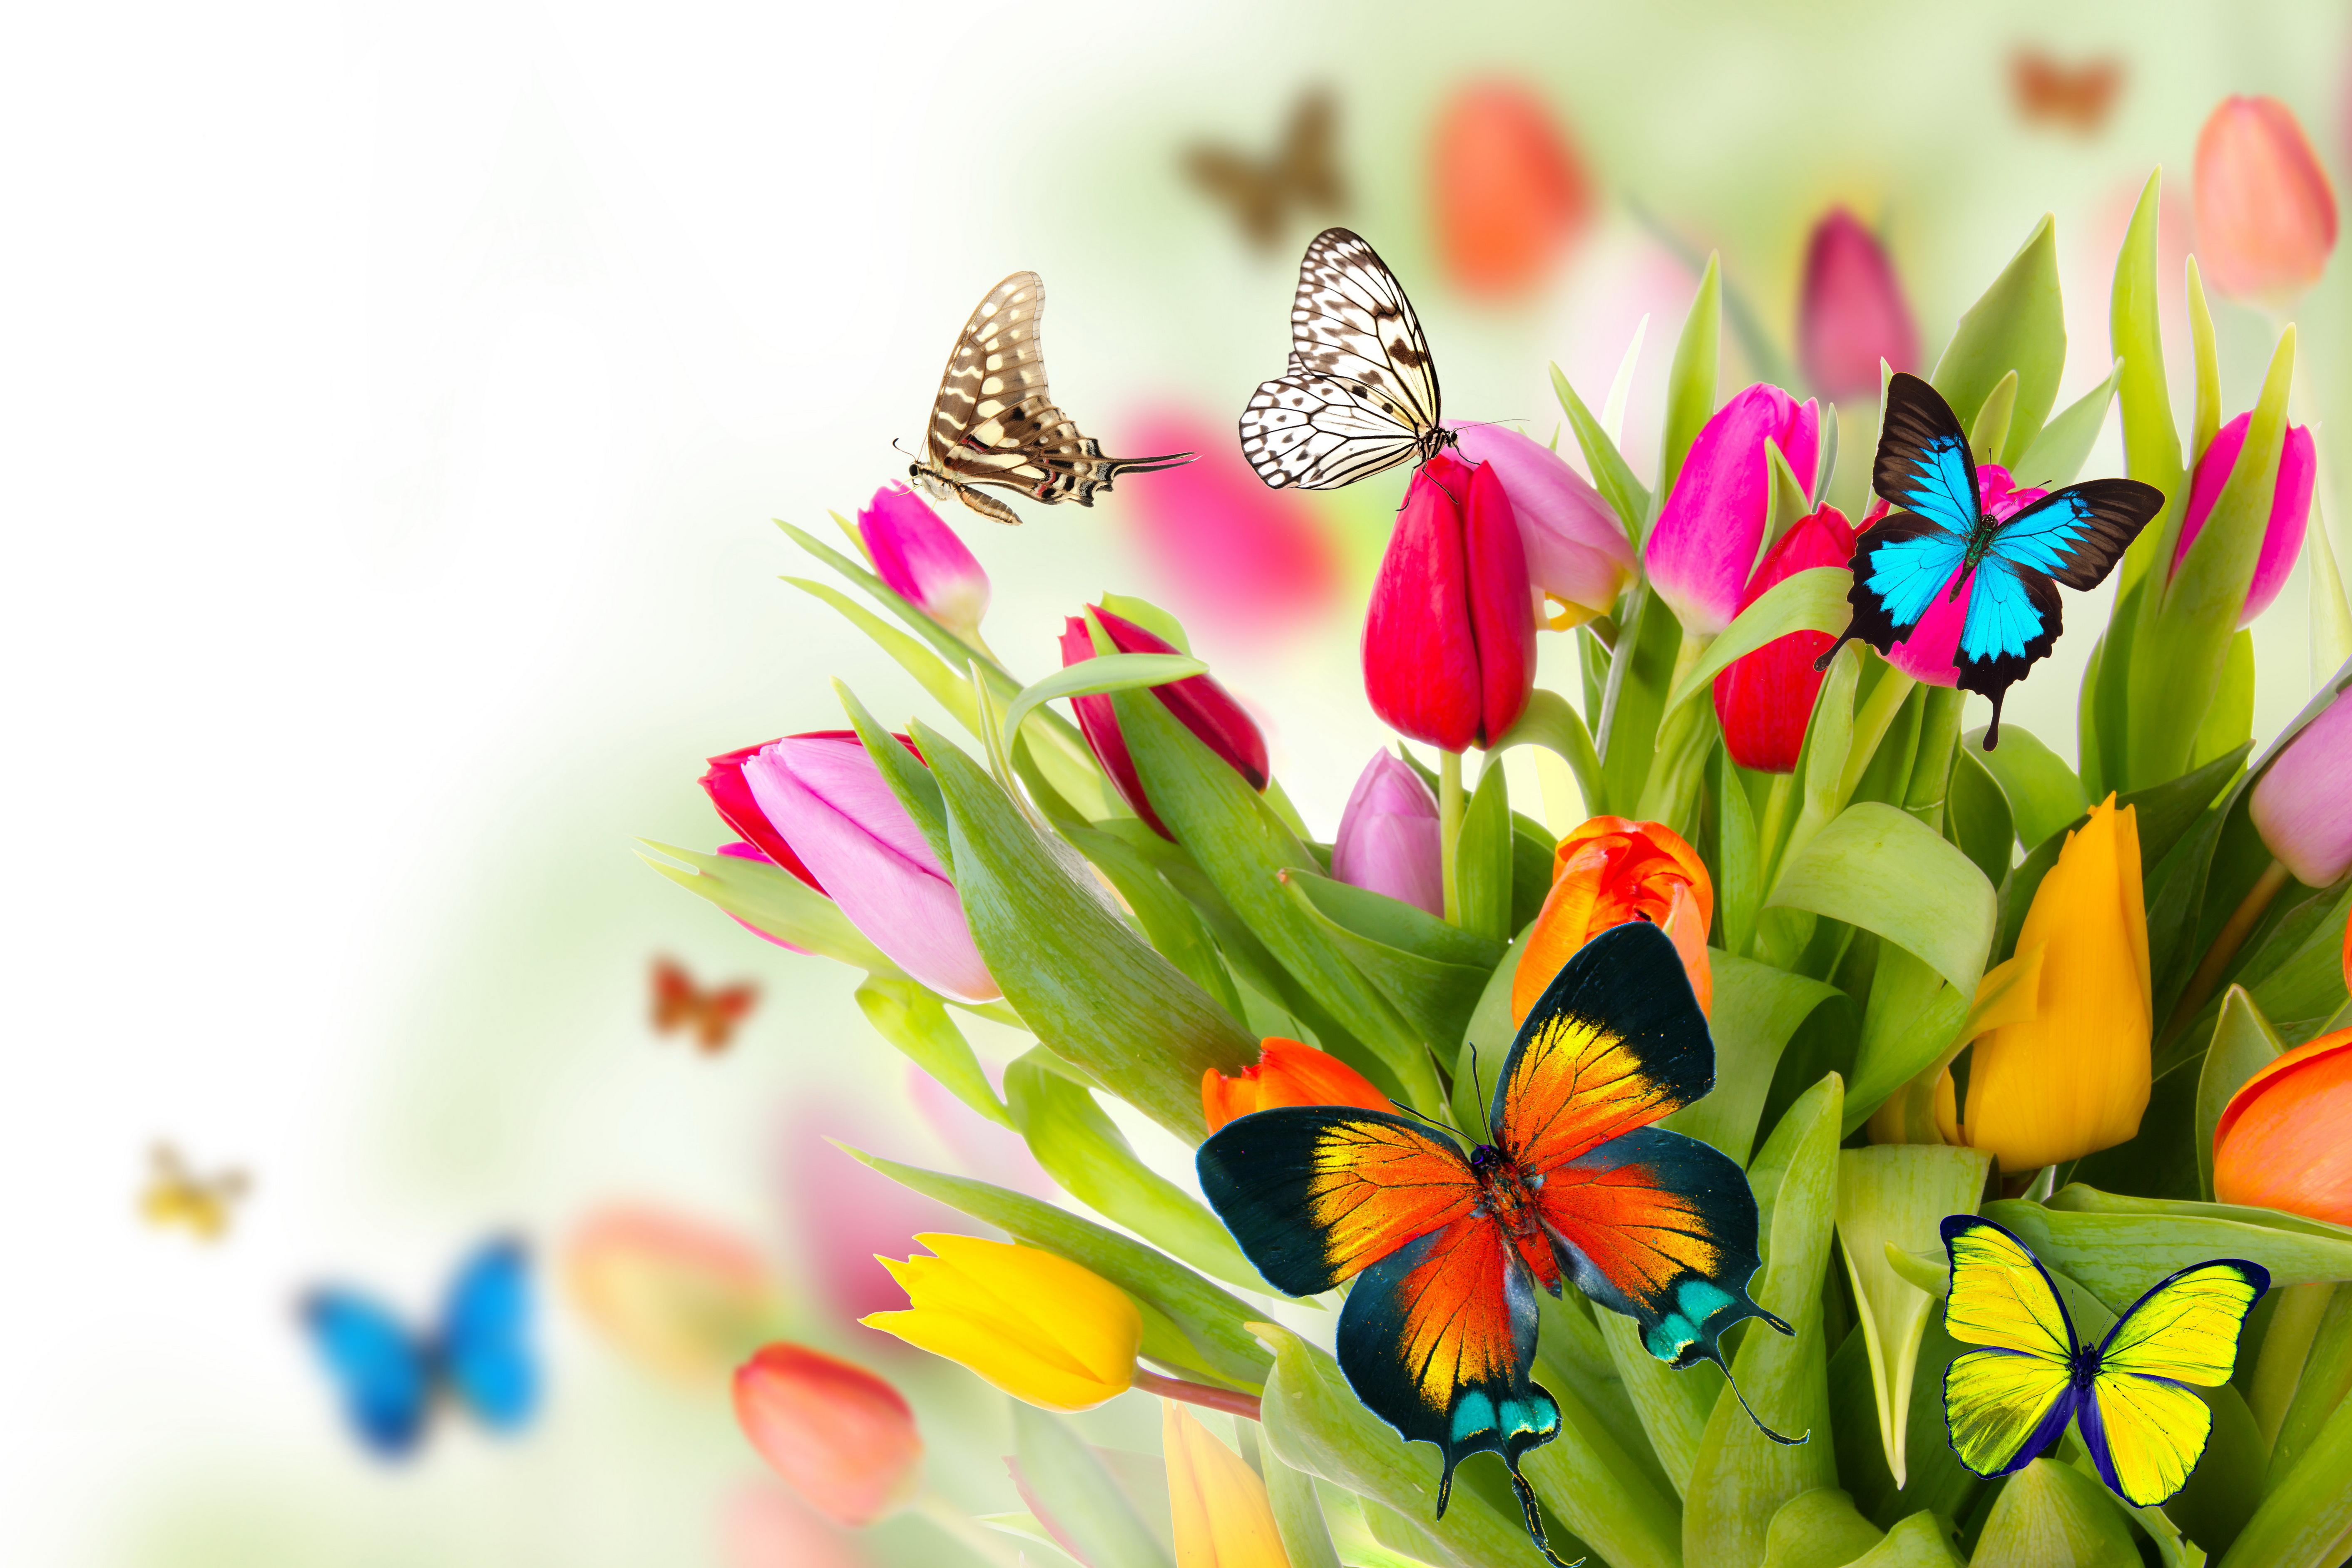 Free Download Spring Flowers Download Clip Art Clip Art On 5650x3767 For Your Desktop Mobile Tablet Explore 62 Free Computer Wallpaper Backgrounds Spring Free Springtime Wallpaper Downloads Spring 3d